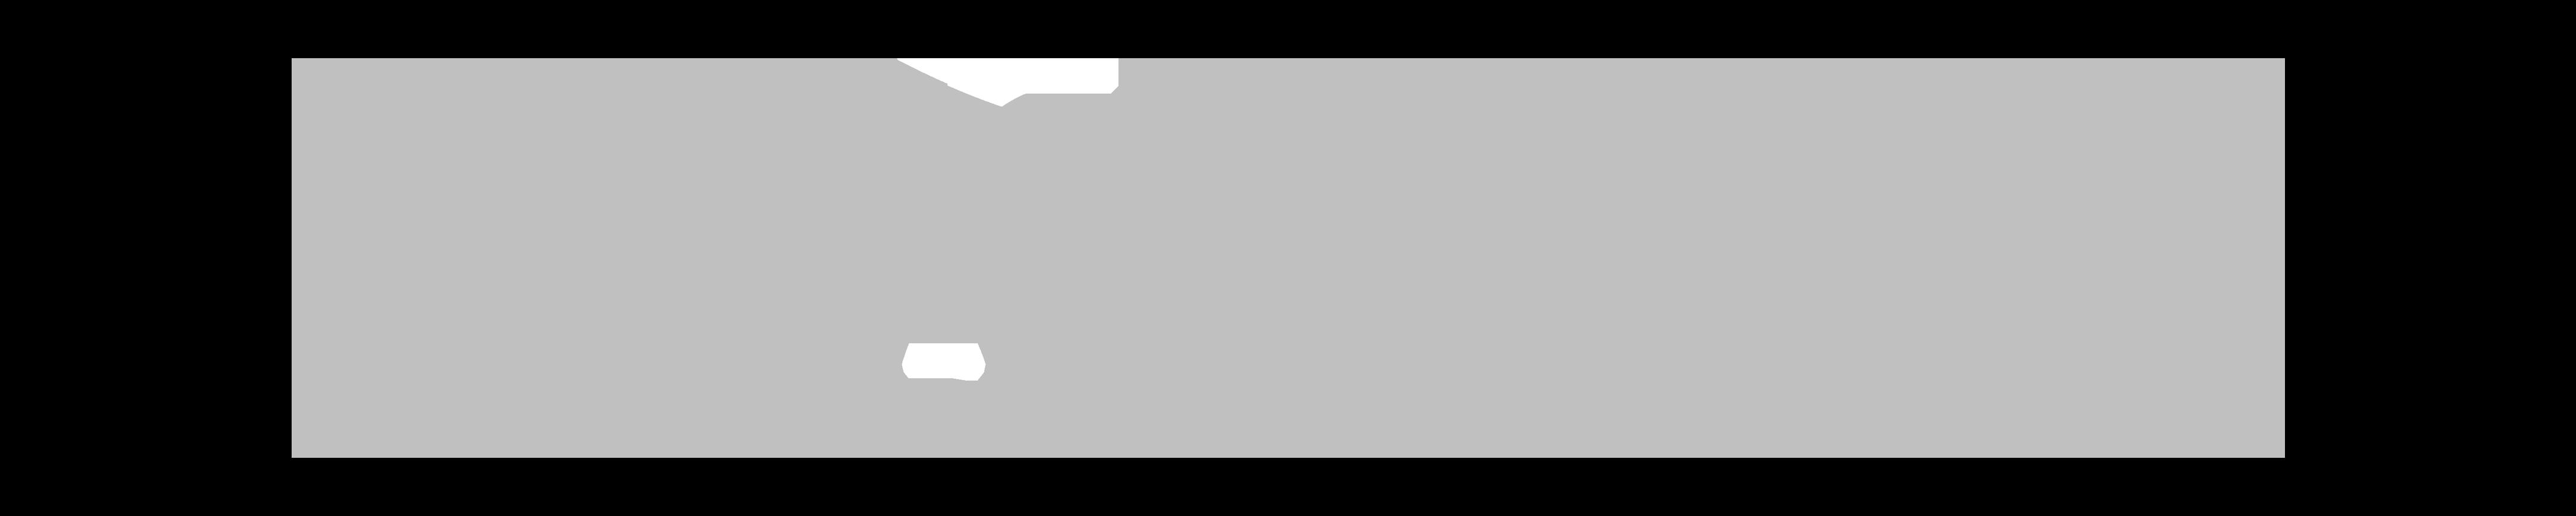 METROSERVI